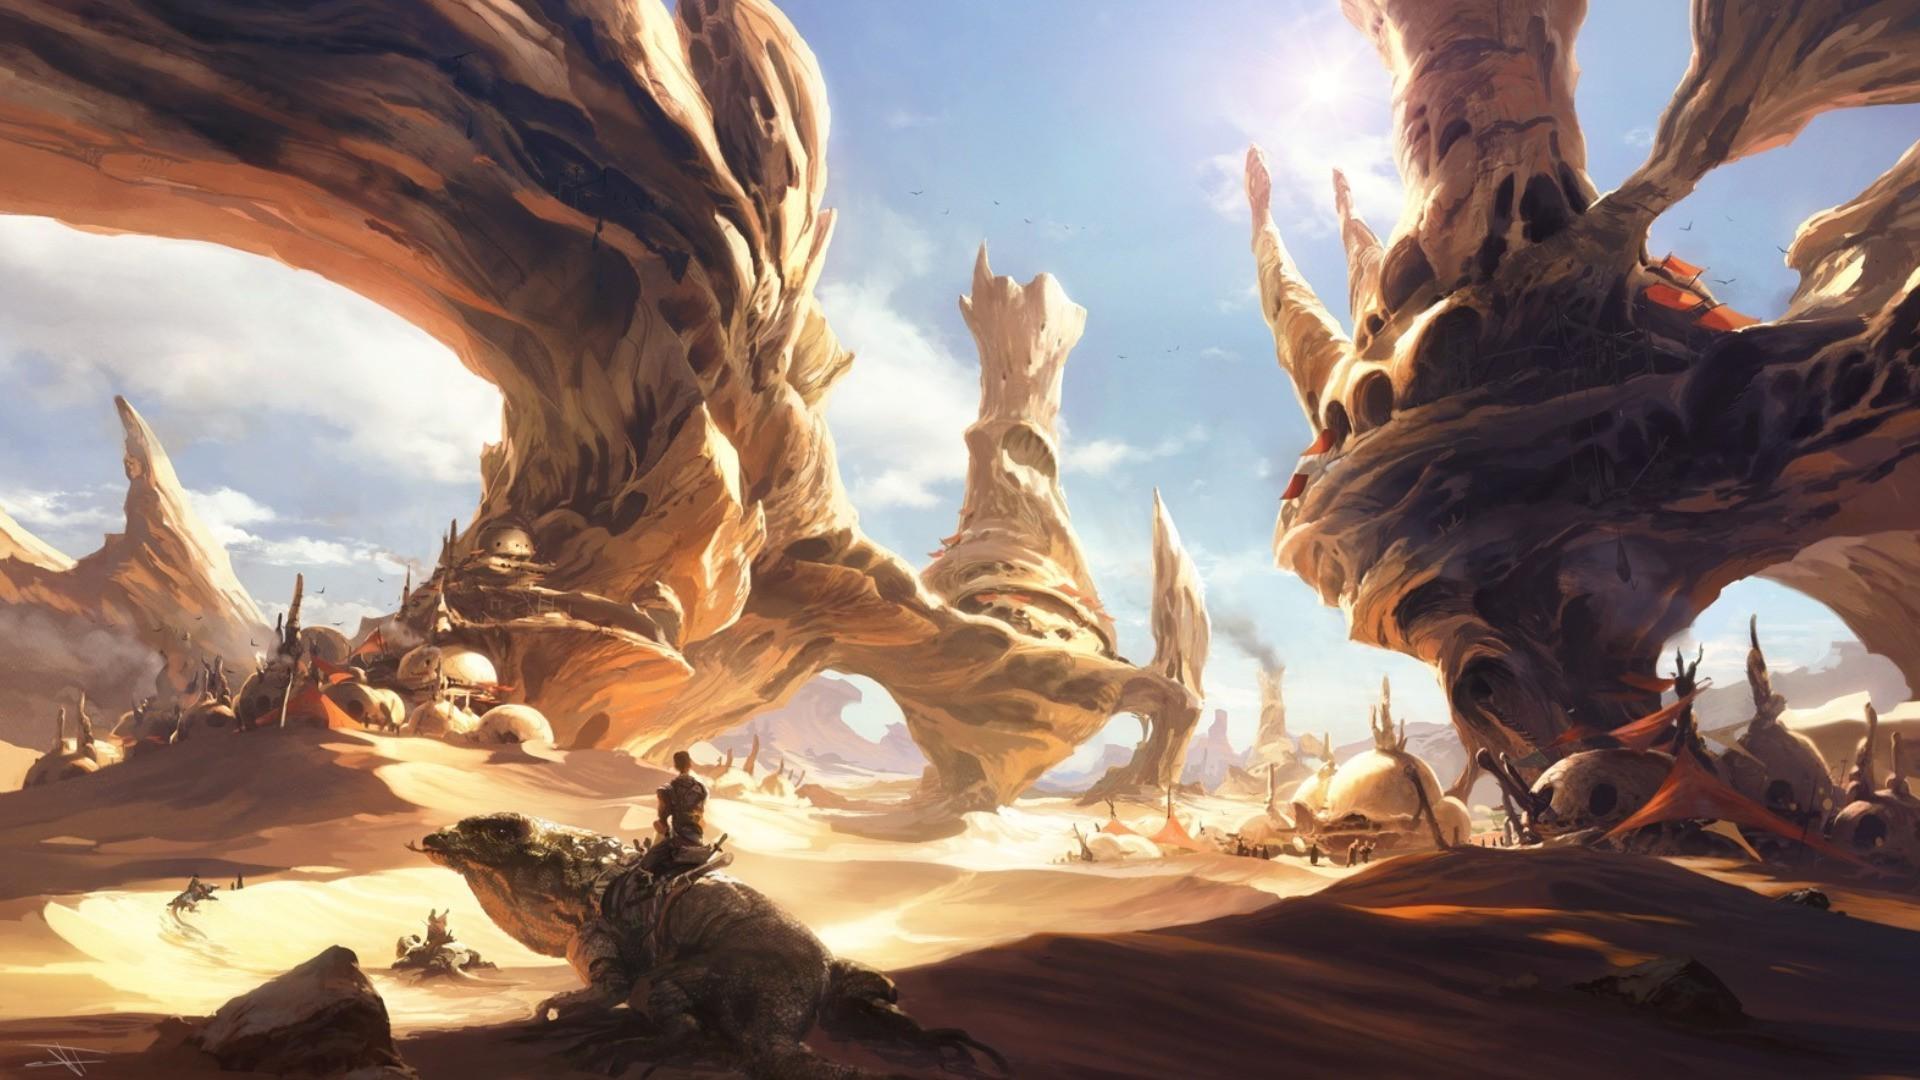 Desert Luke Skywalker Star Wars Wallpapers Hd Desktop Giant Frog Man Fantasy 1920x1080 Wallpaper Teahub Io